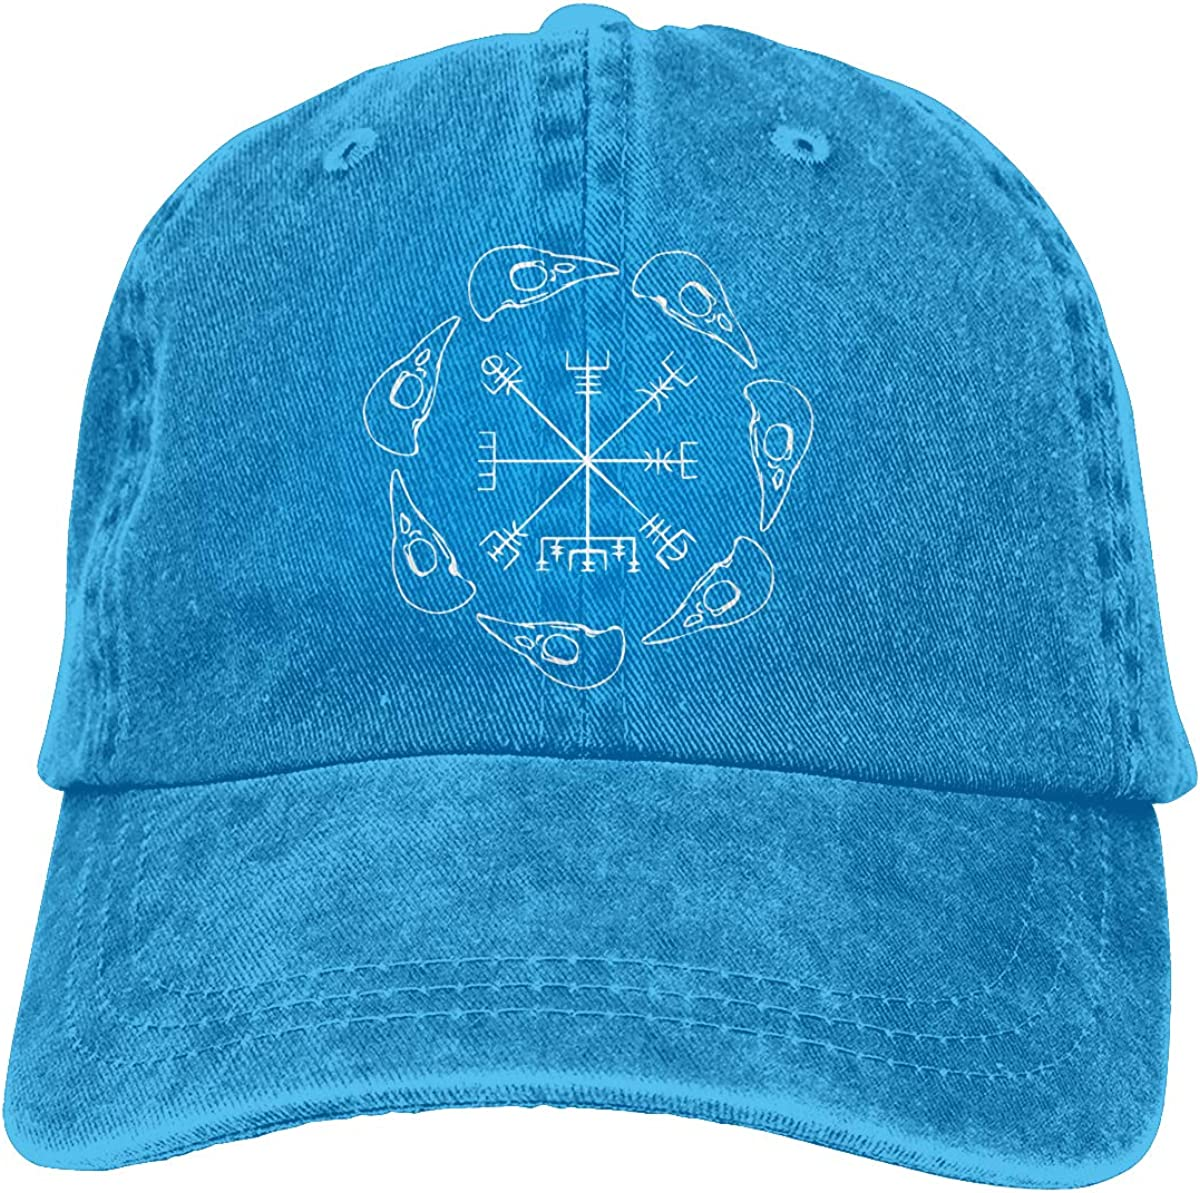 TBVS 77 Men Women Adjustable Yarn-Dyed Denim Baseball Cap Vegvisir Hiphop Cap